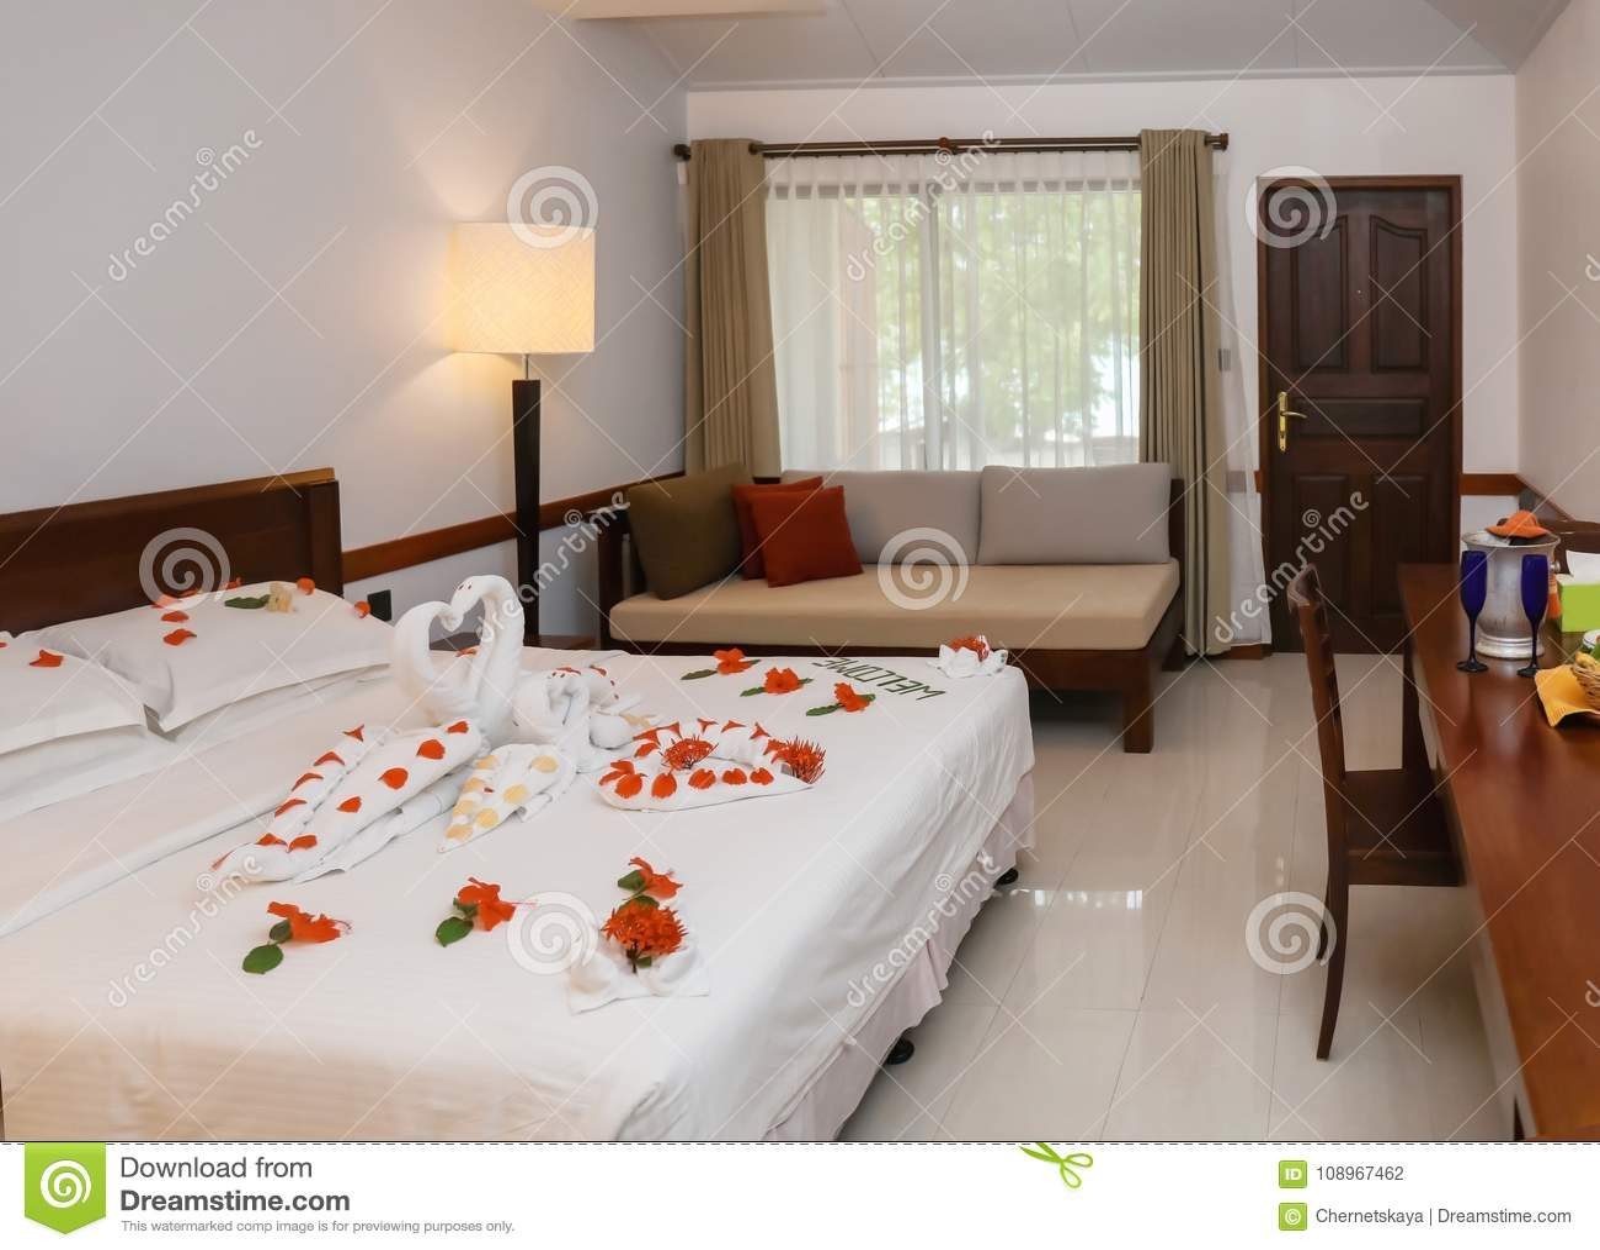 777ce6d78d6 Δωμάτιο ξενοδοχείου που προετοιμάζεται για ρομαντικό Στοκ Εικόνες ...